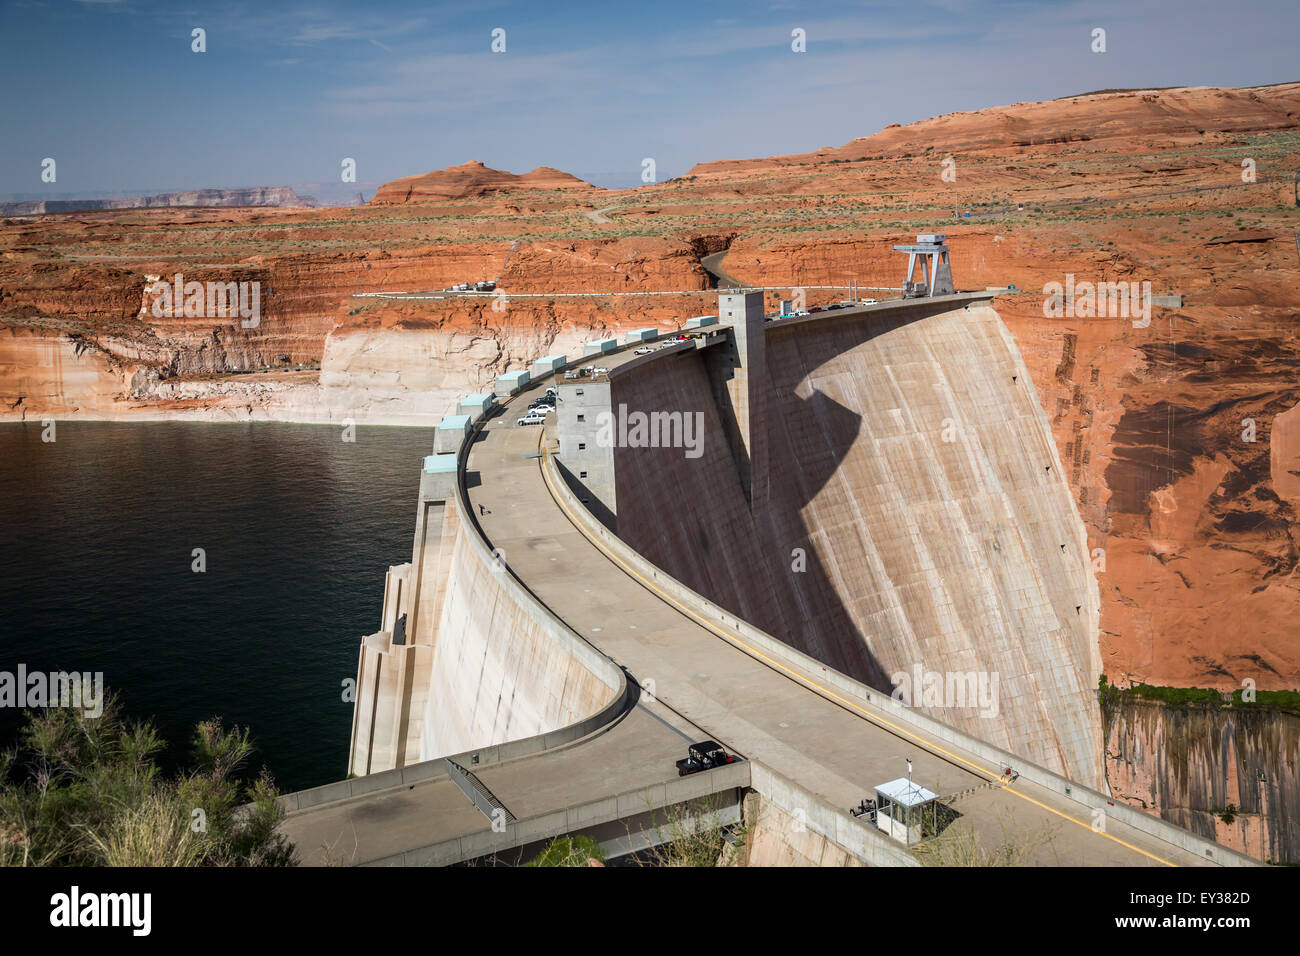 The Glen Canyon Dam on the Colorado River near Page, Arizona, USA. - Stock Image